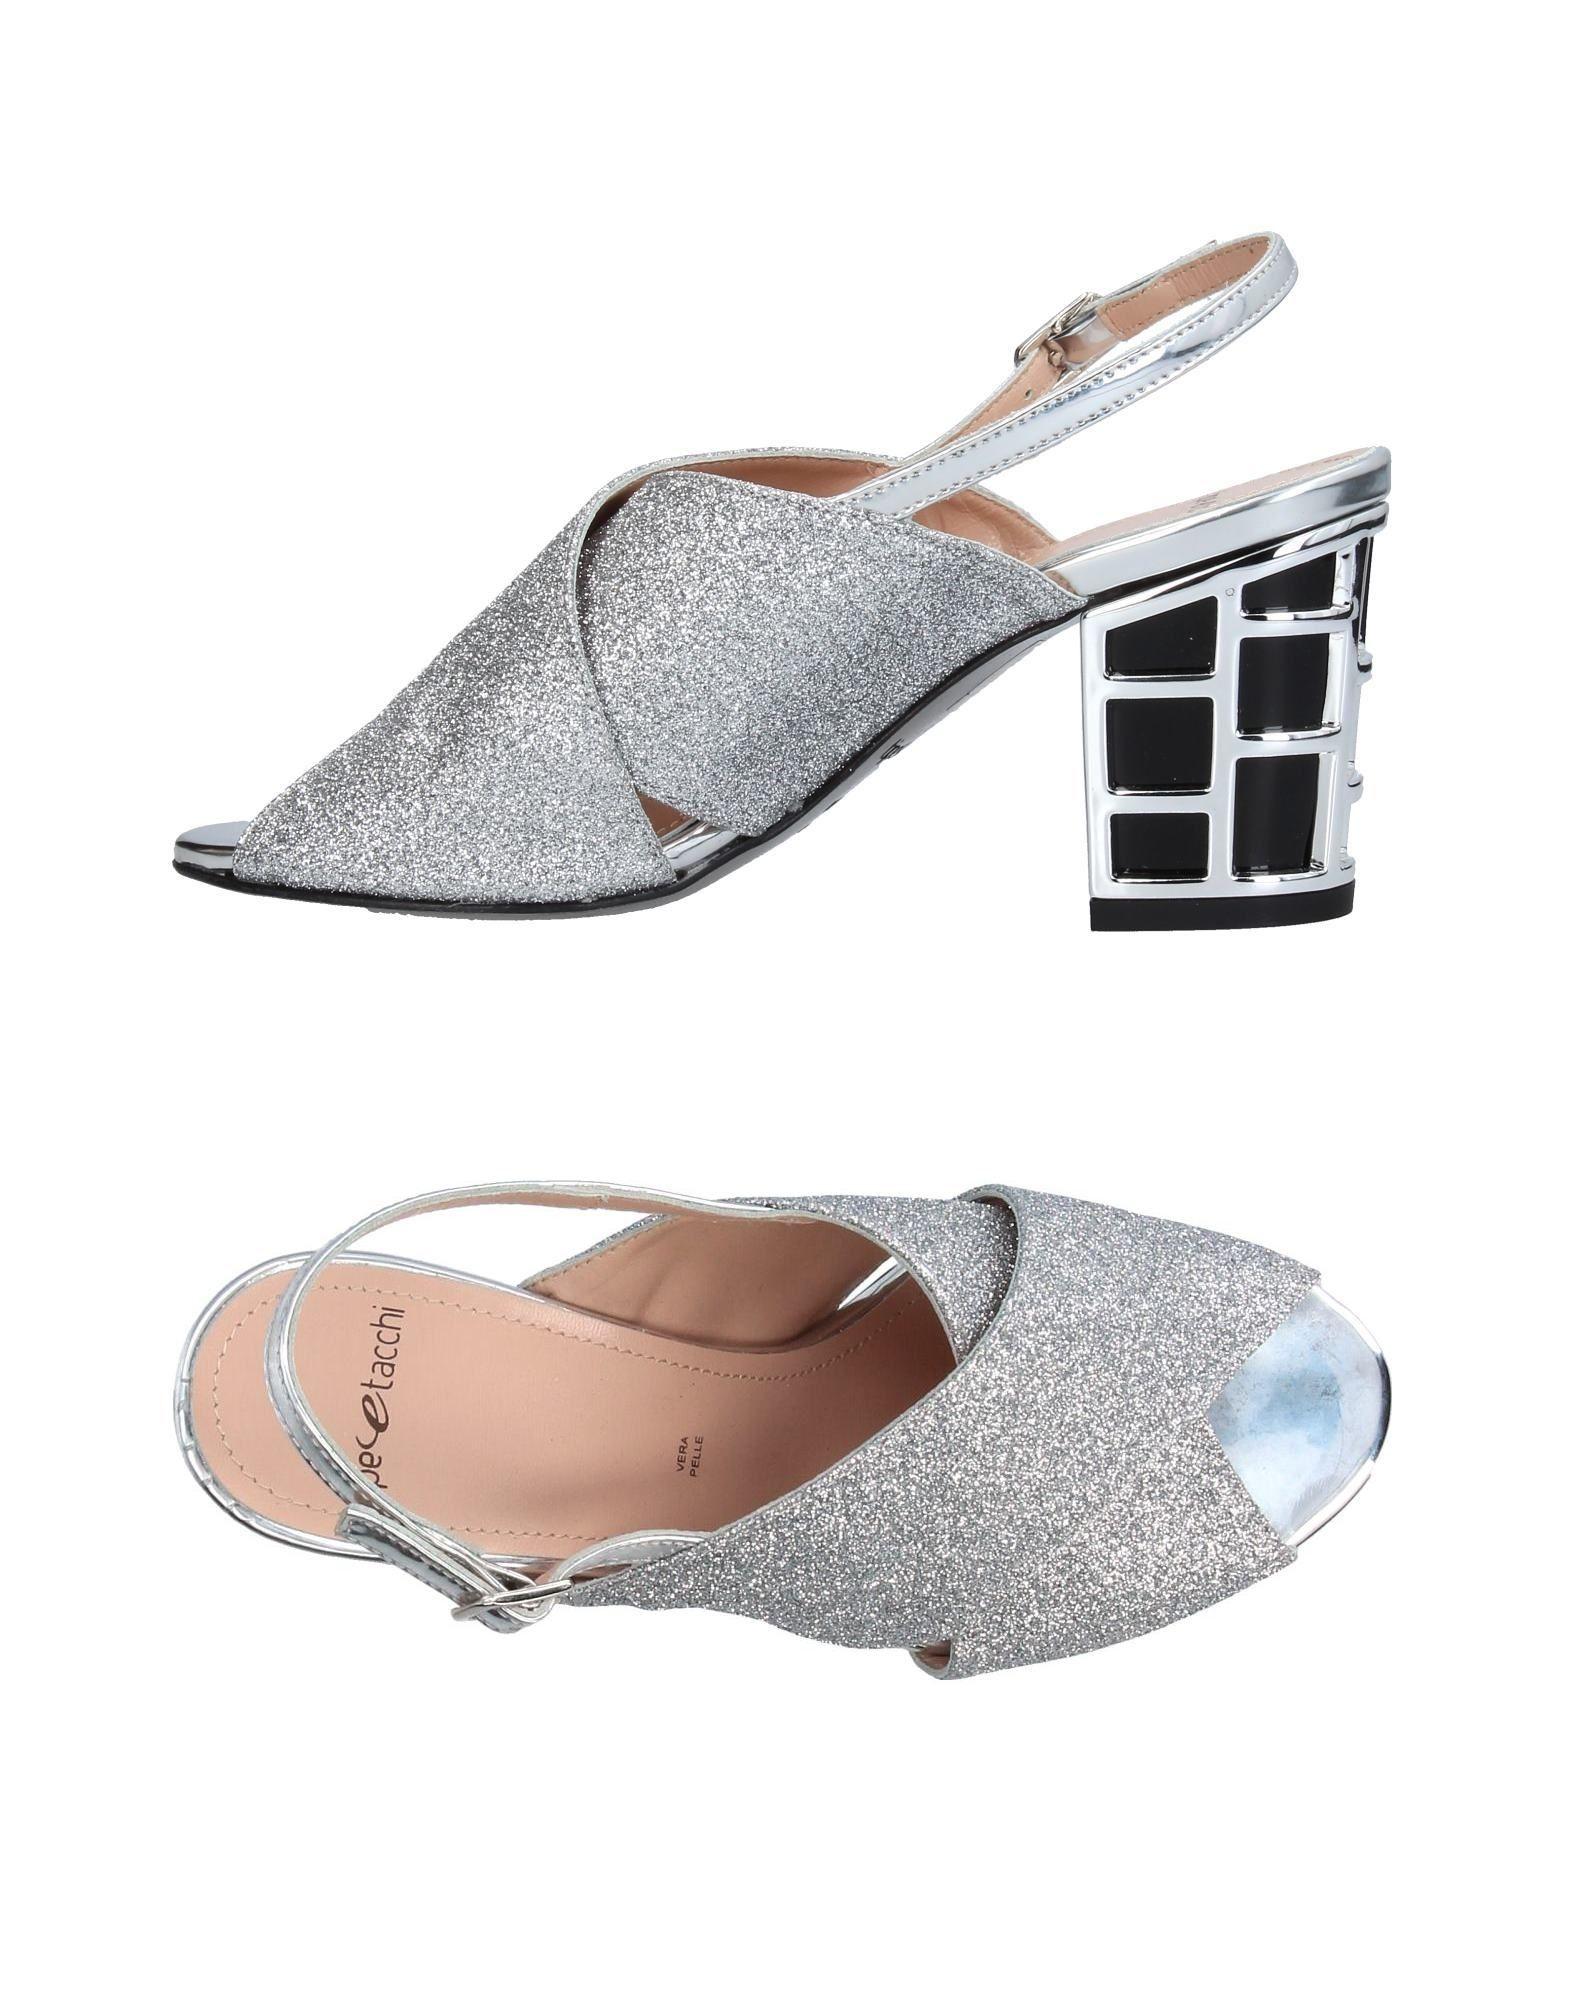 Tipe E Tacchi Sandalen Damen  11377795MC Gute Qualität beliebte Schuhe